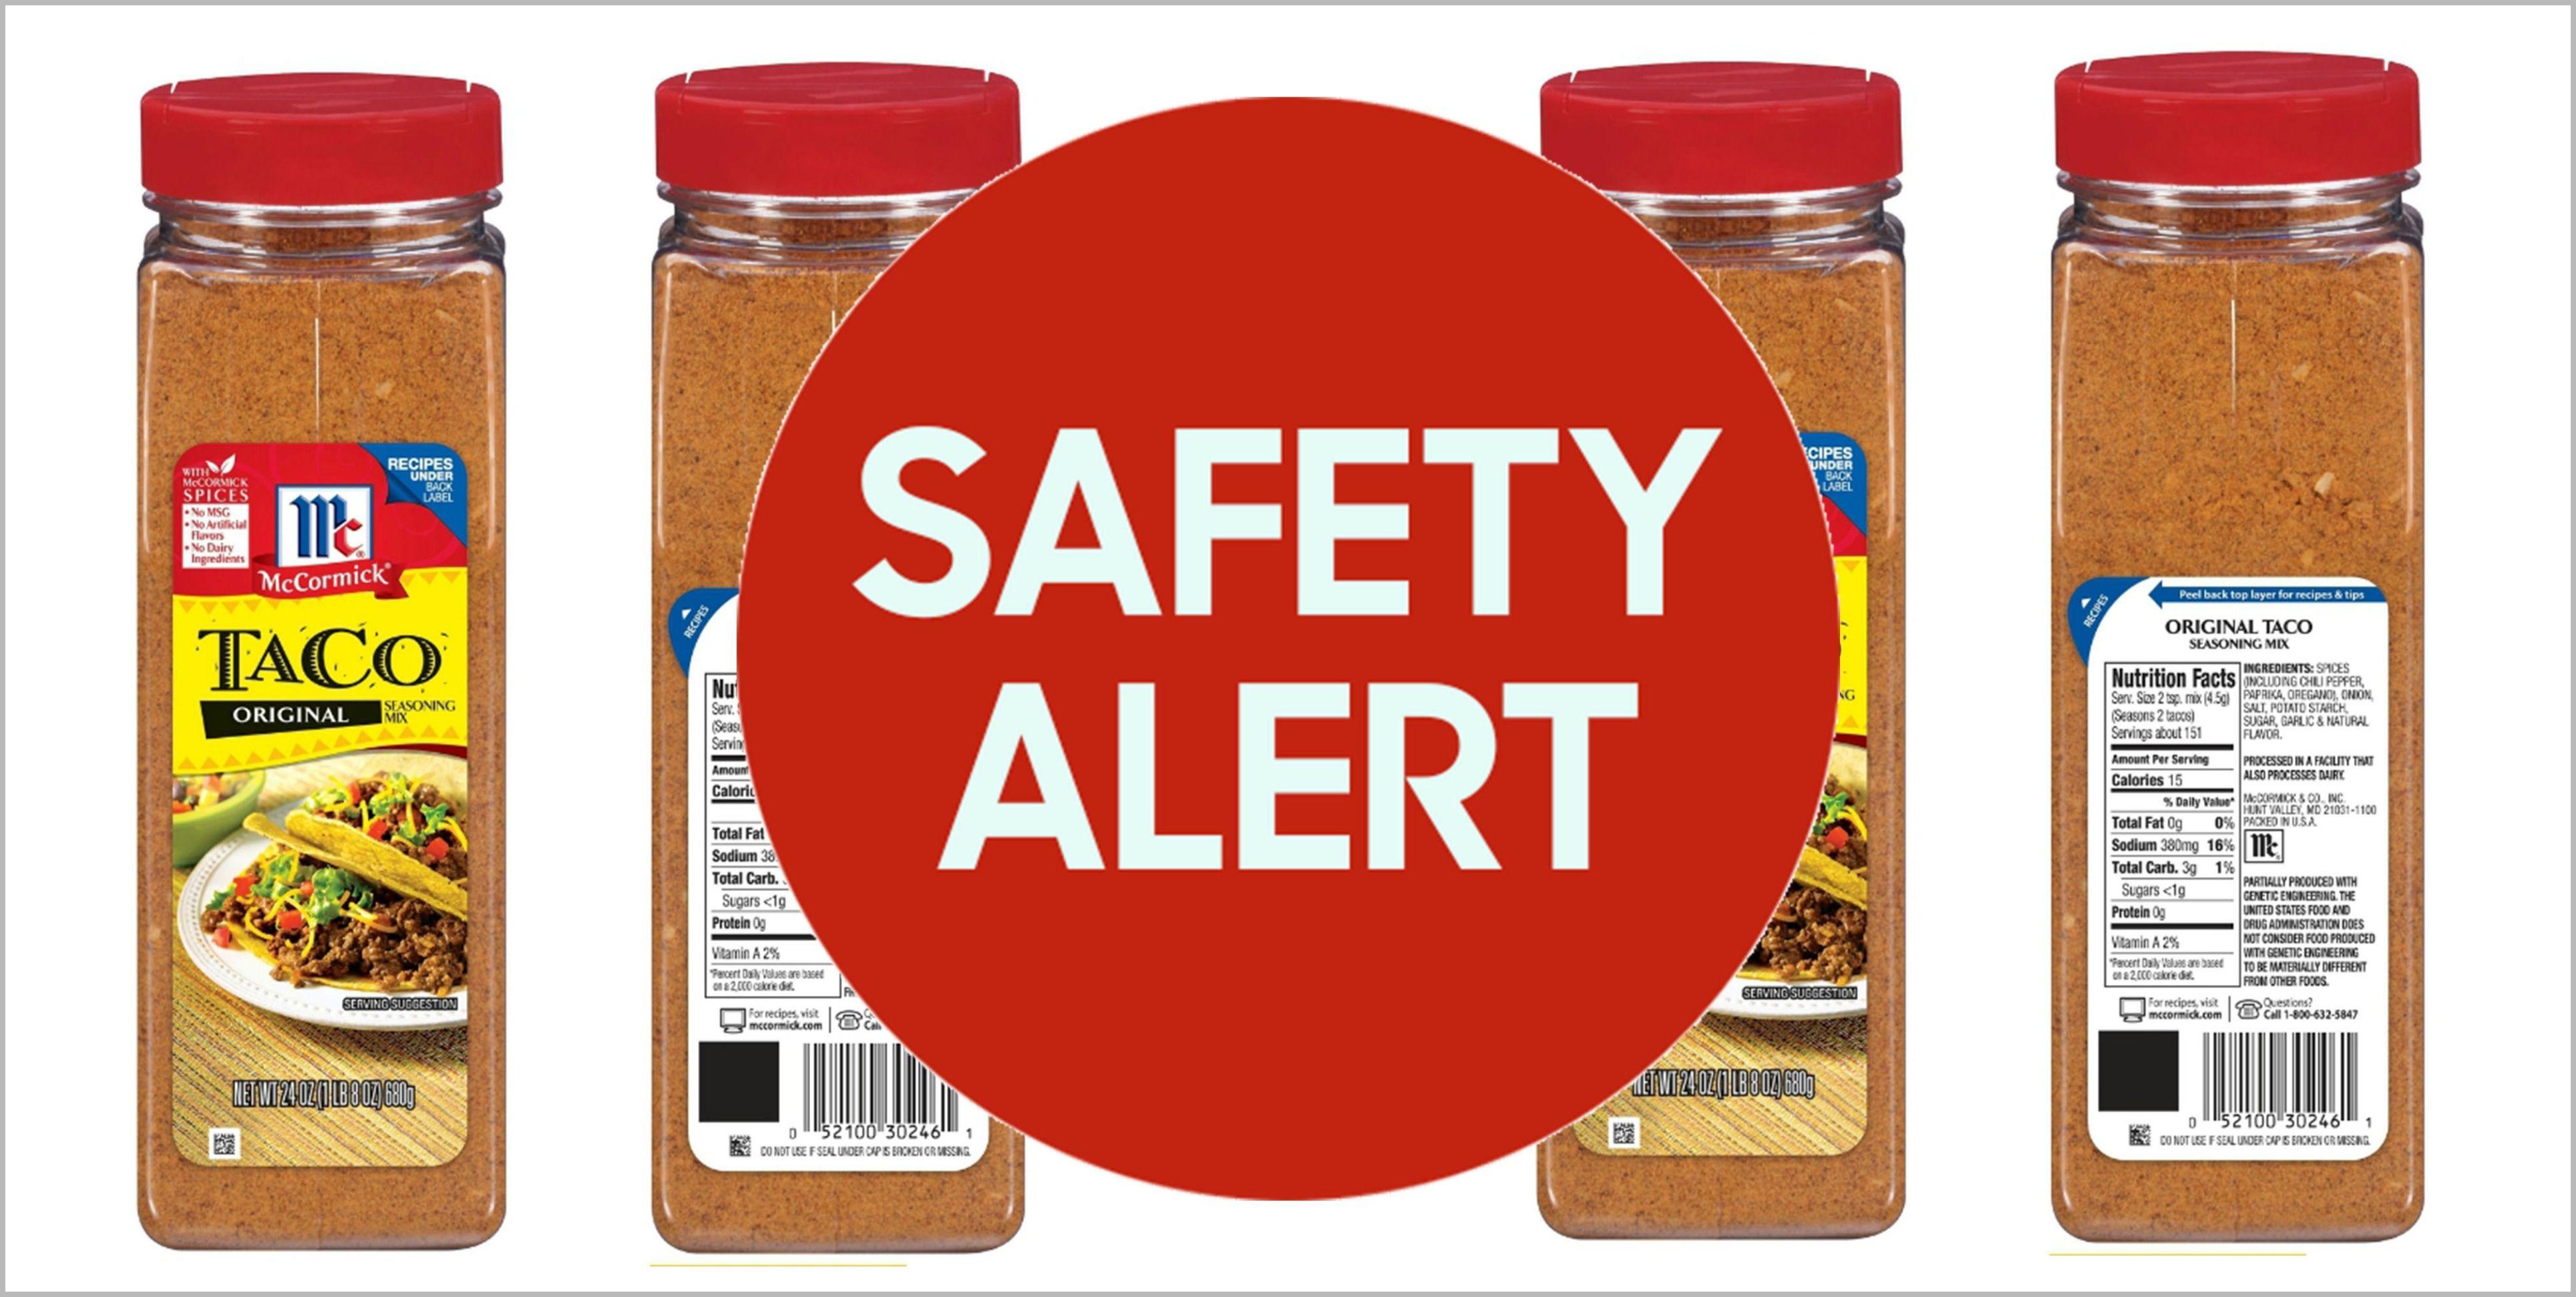 Mccormick Taco Seasoning Recalled Due To Dairy Contamination Mccormick Taco Seasoning Recall